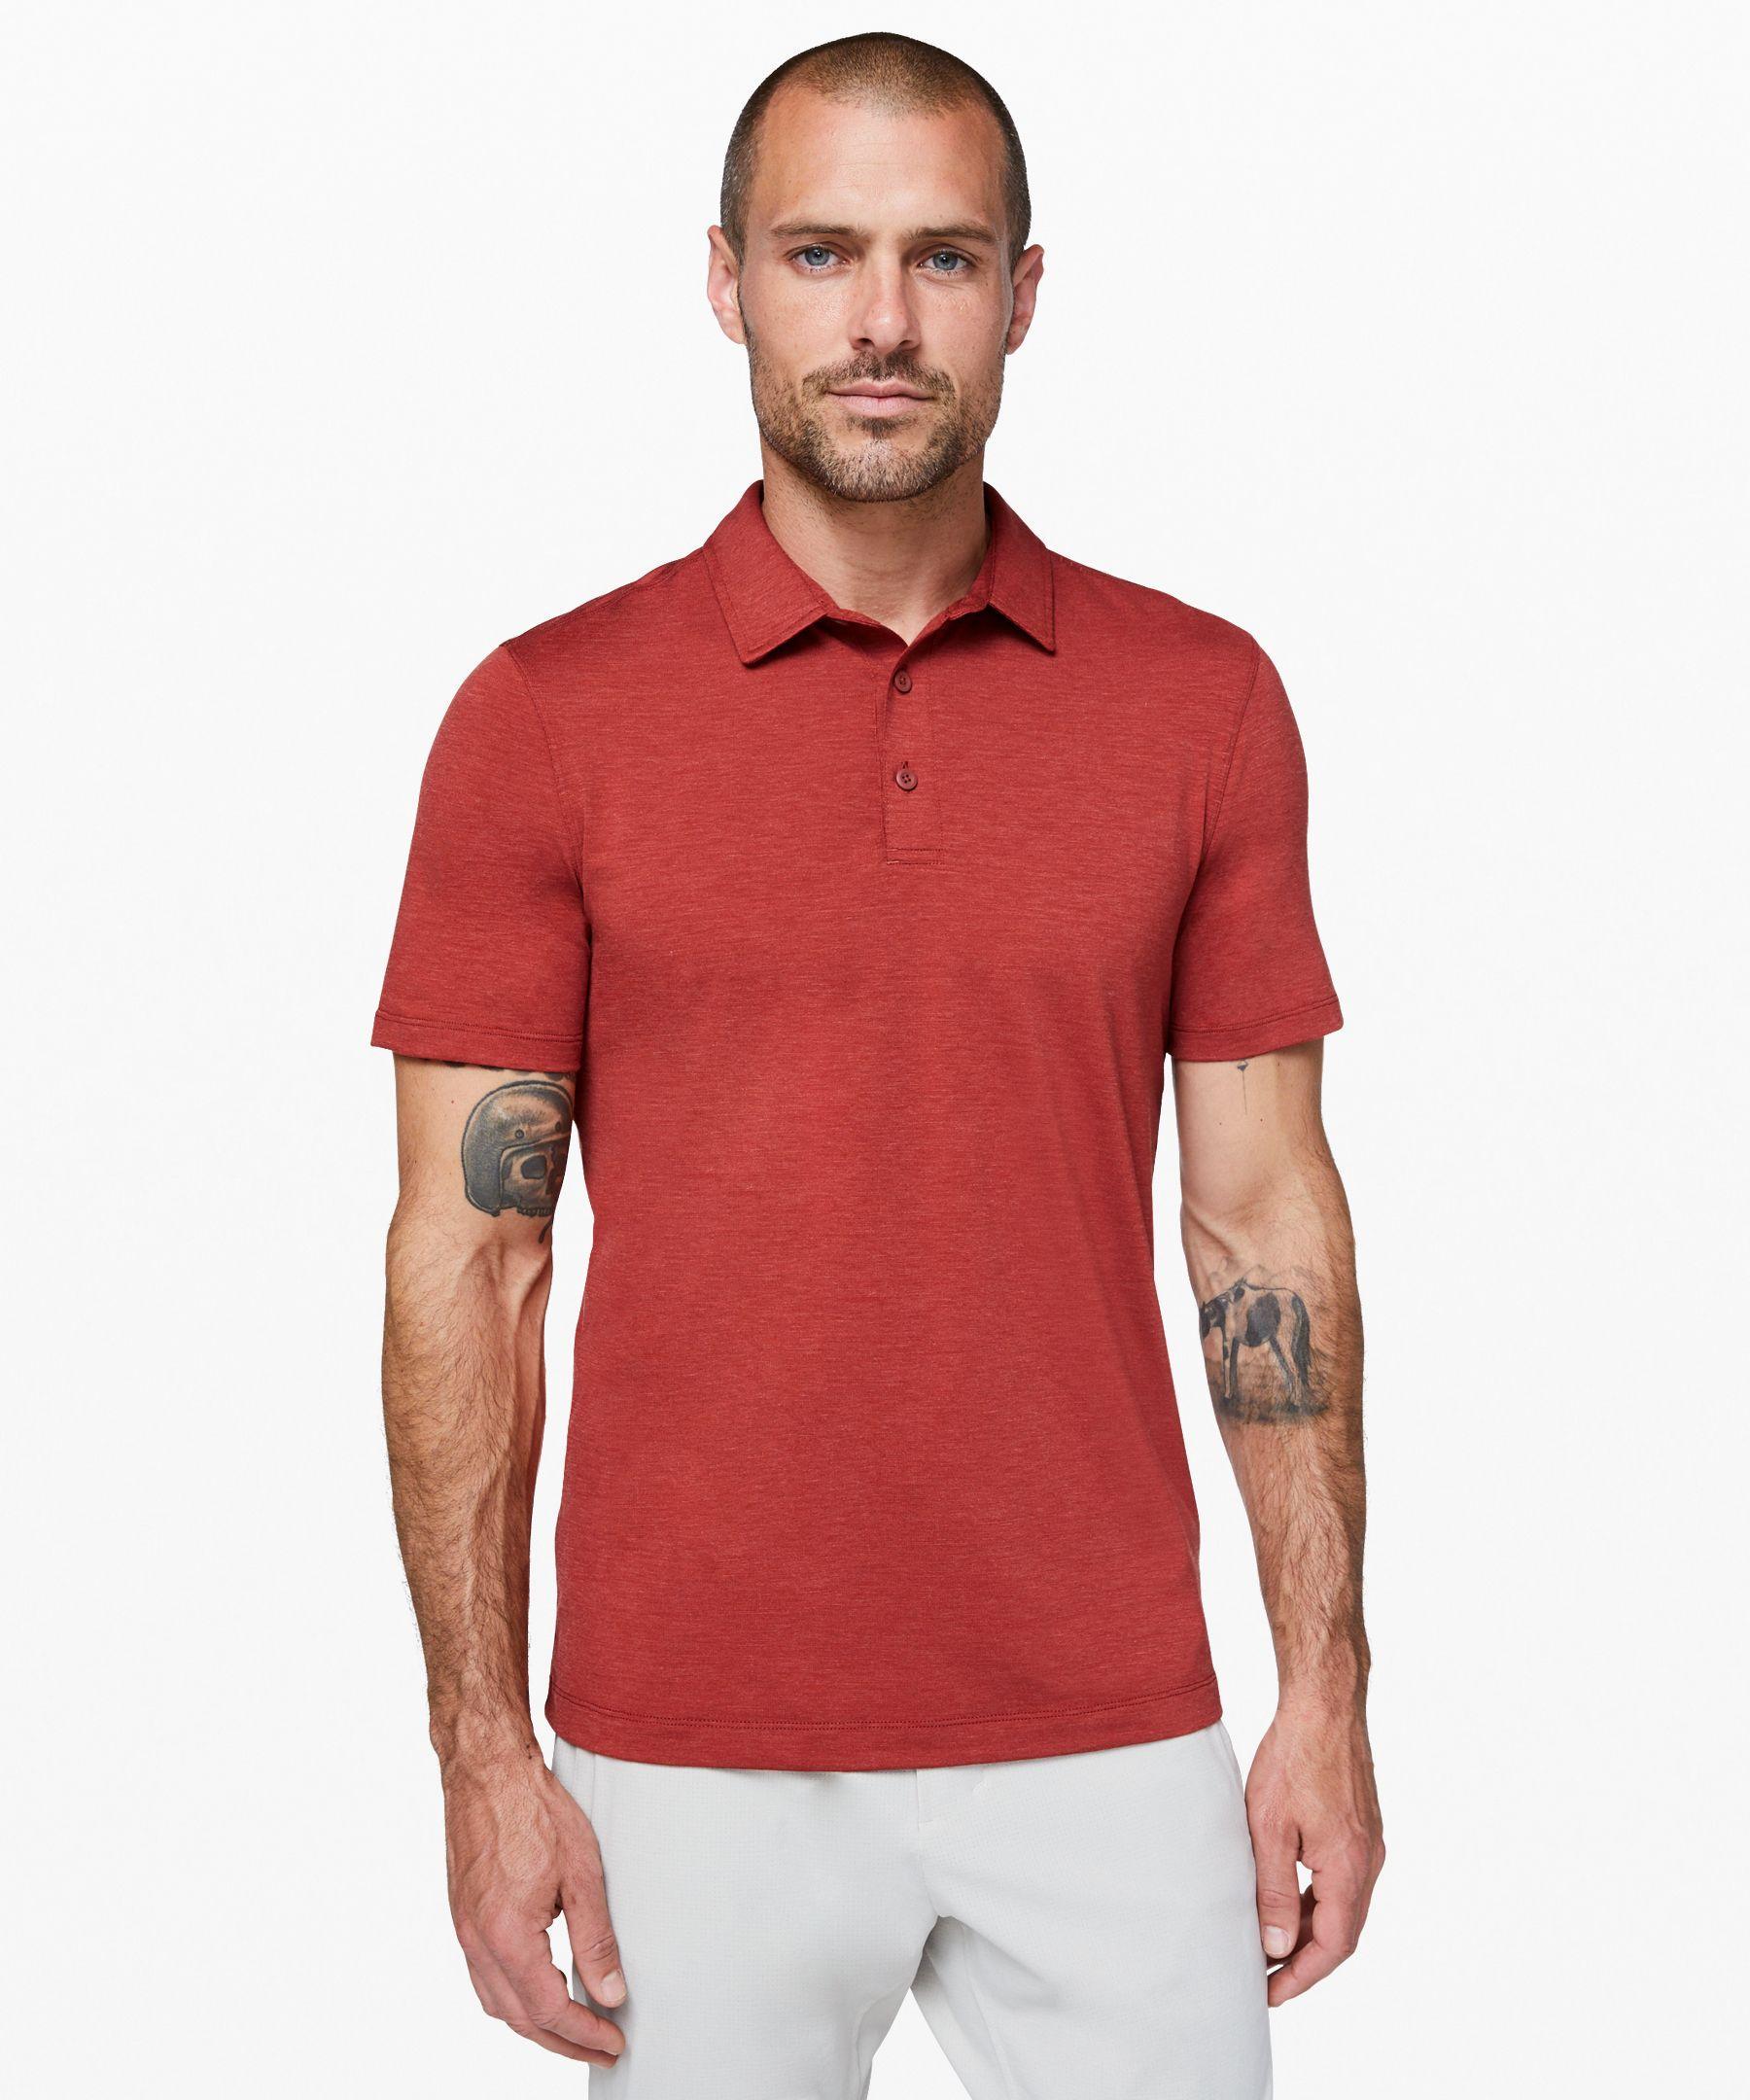 Lululemon Evolution Polo In Red